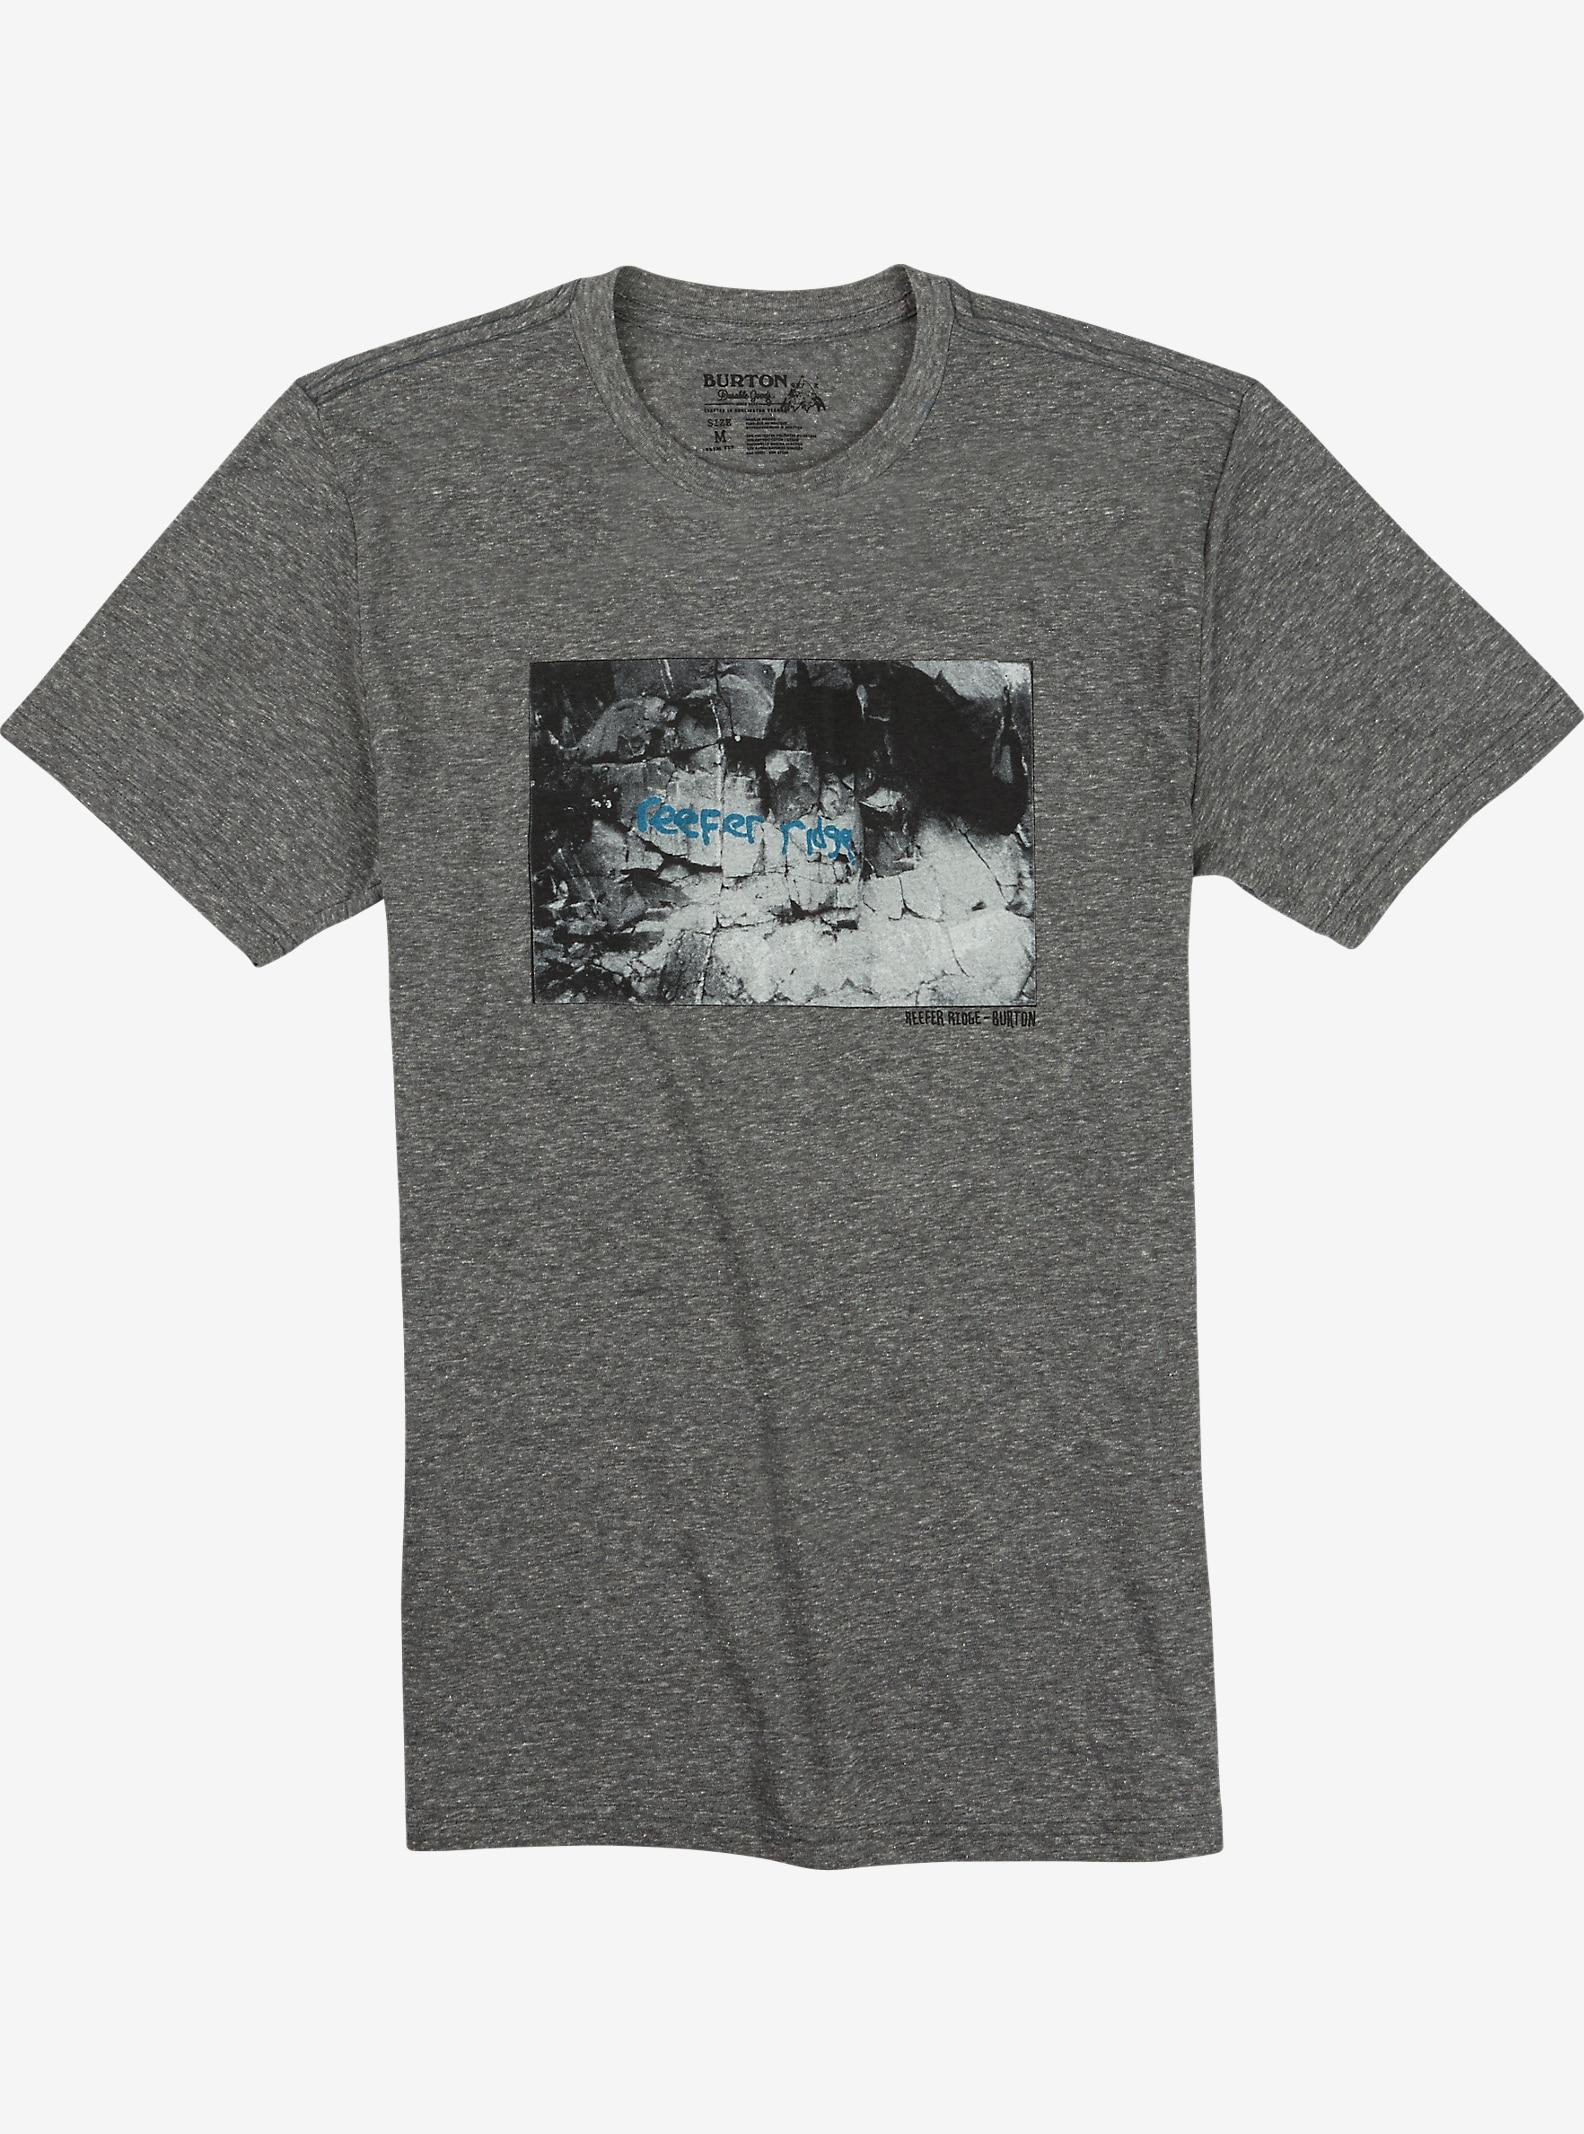 Burton Reefer Ridge Slim Fit Short Sleeve T Shirt shown in Gray Heather